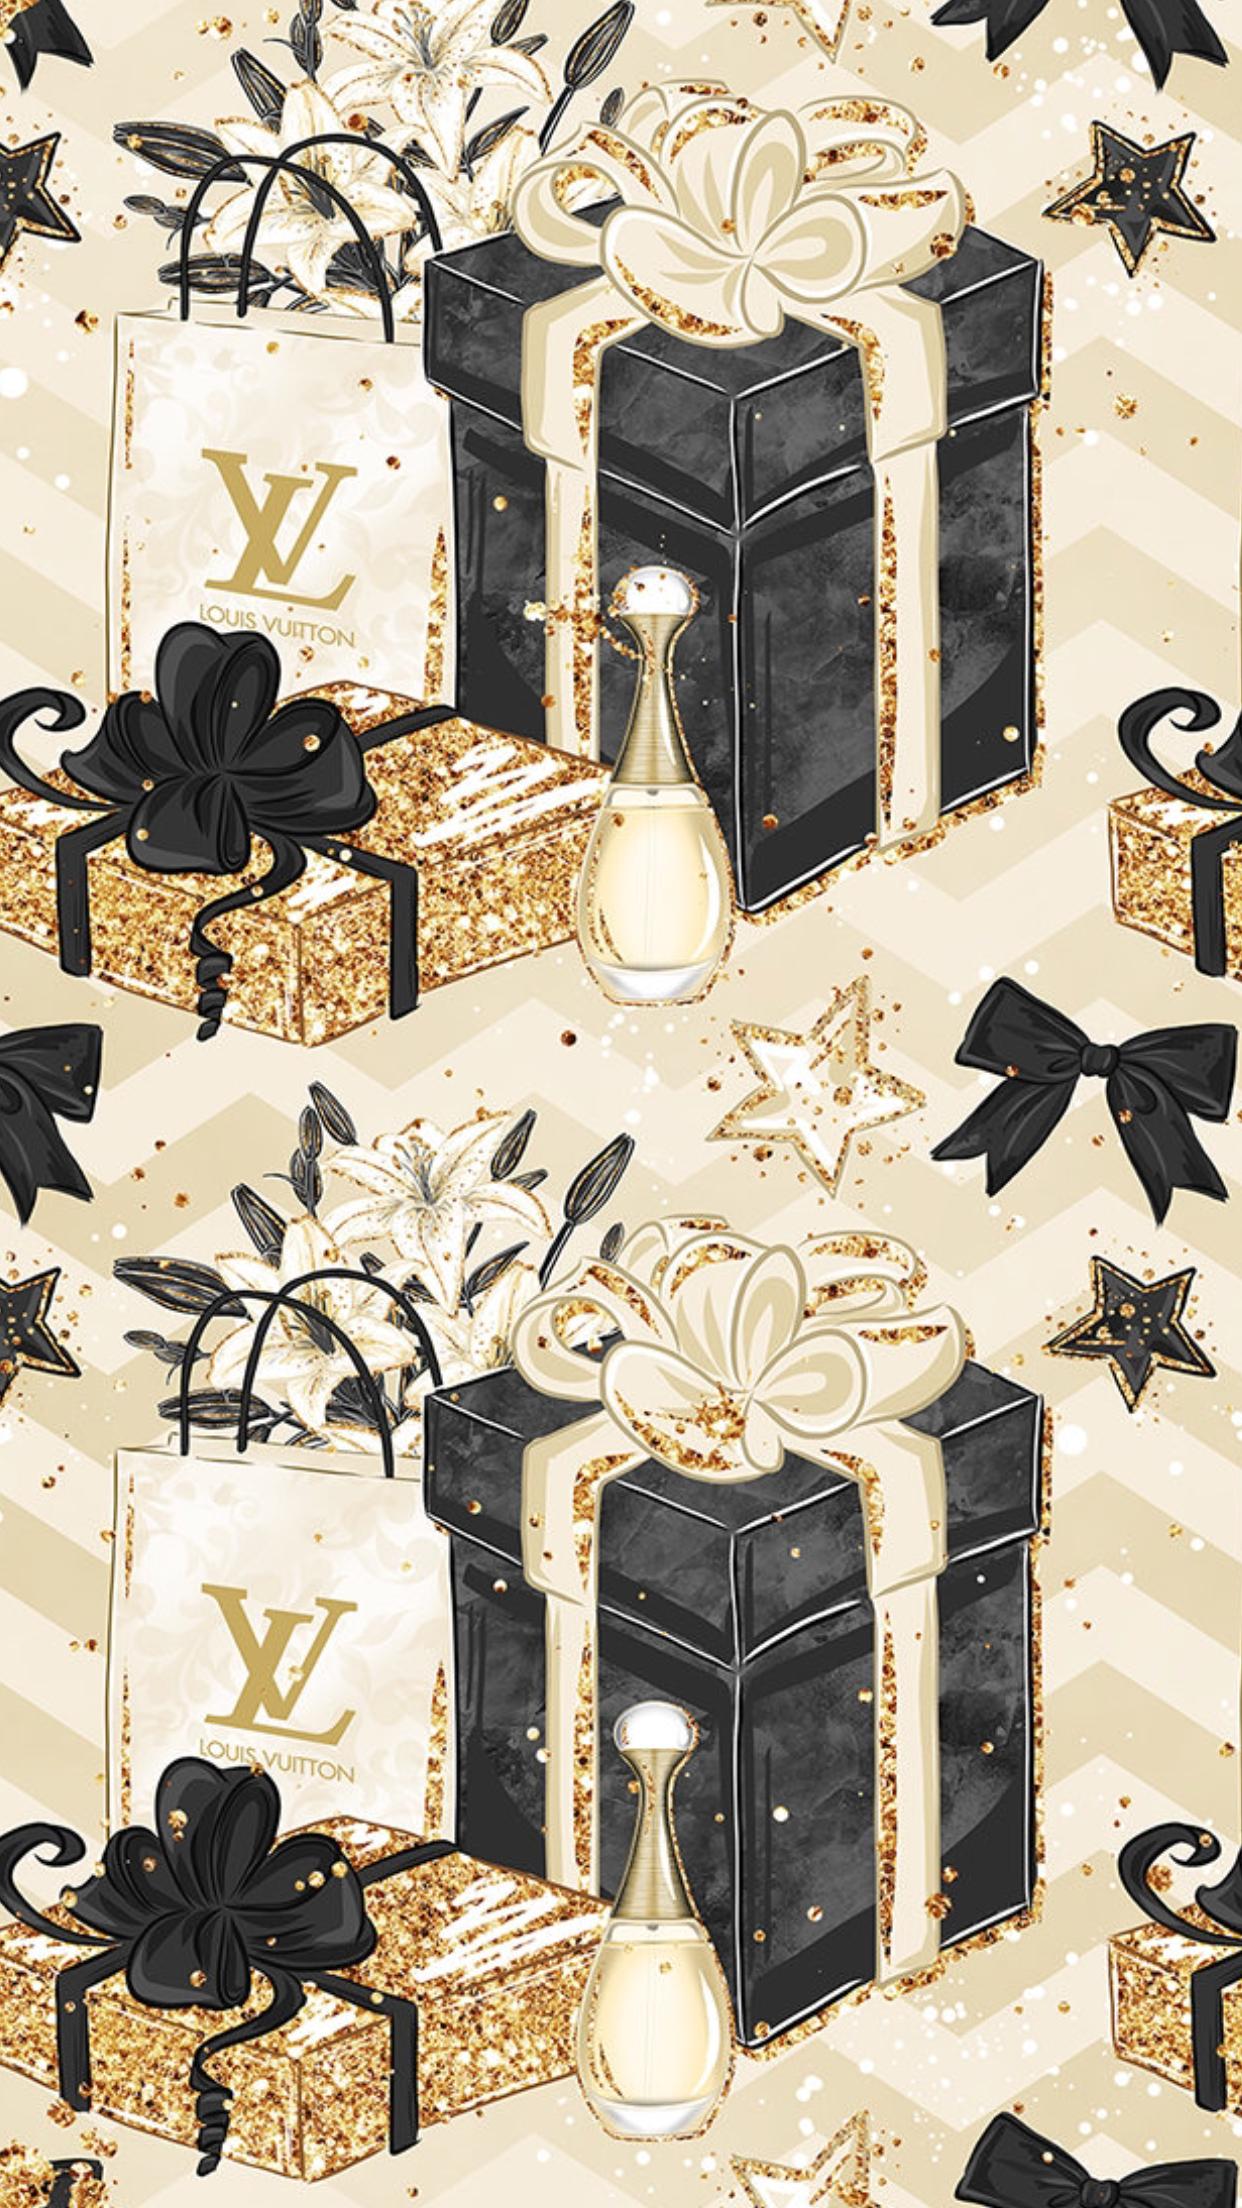 Louis Vuitton Fashion wallpaper, Art, Iphone wallpaper